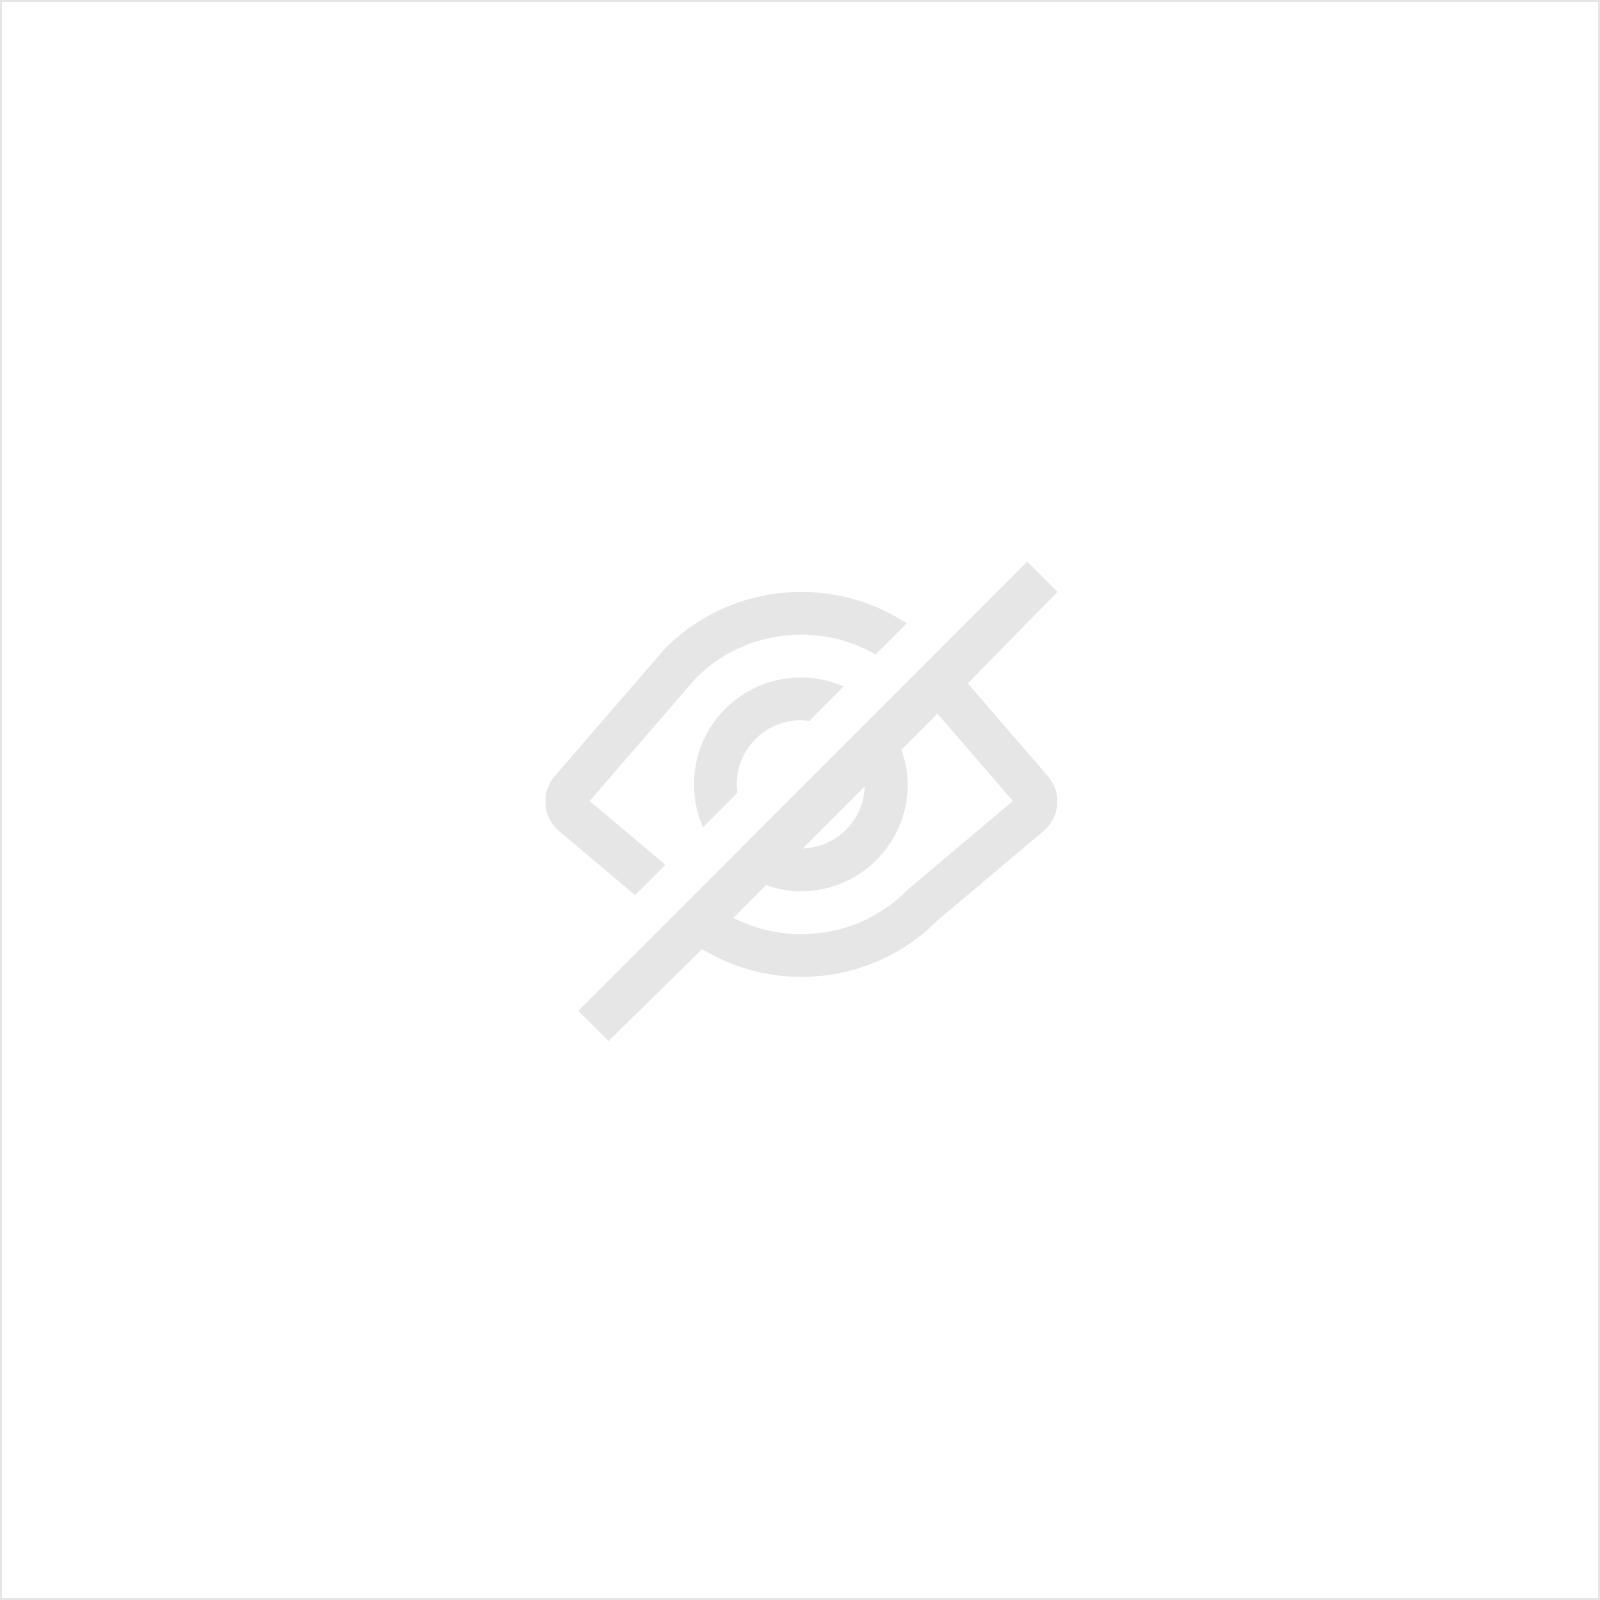 NOVOL ISOLERENDE EPOXY PRIMER MET CORROSIEWERENDE ADDITIEVEN - 2,5 L (65234)